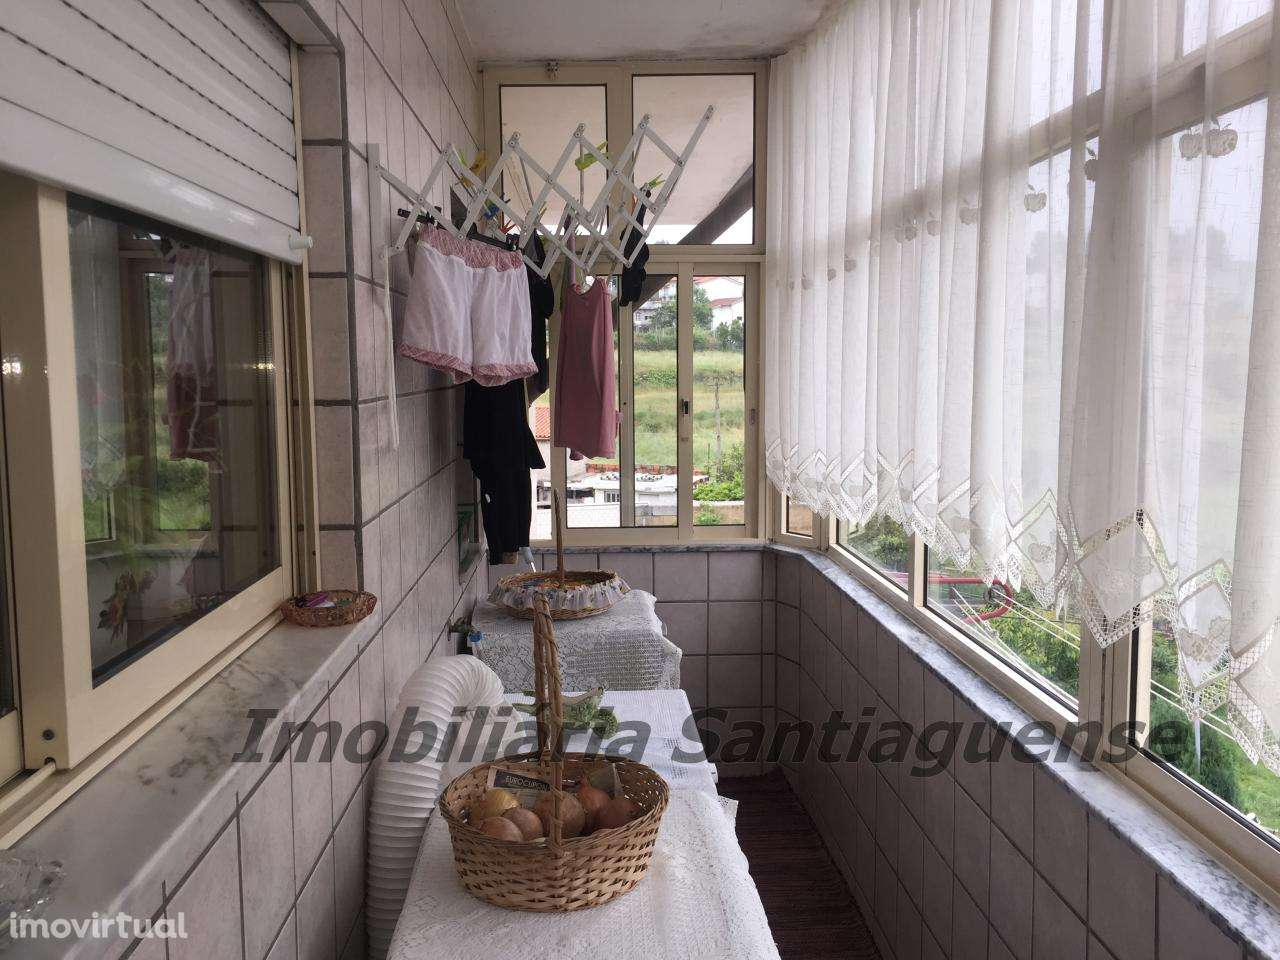 Apartamento para comprar, Vila de Cucujães, Aveiro - Foto 3